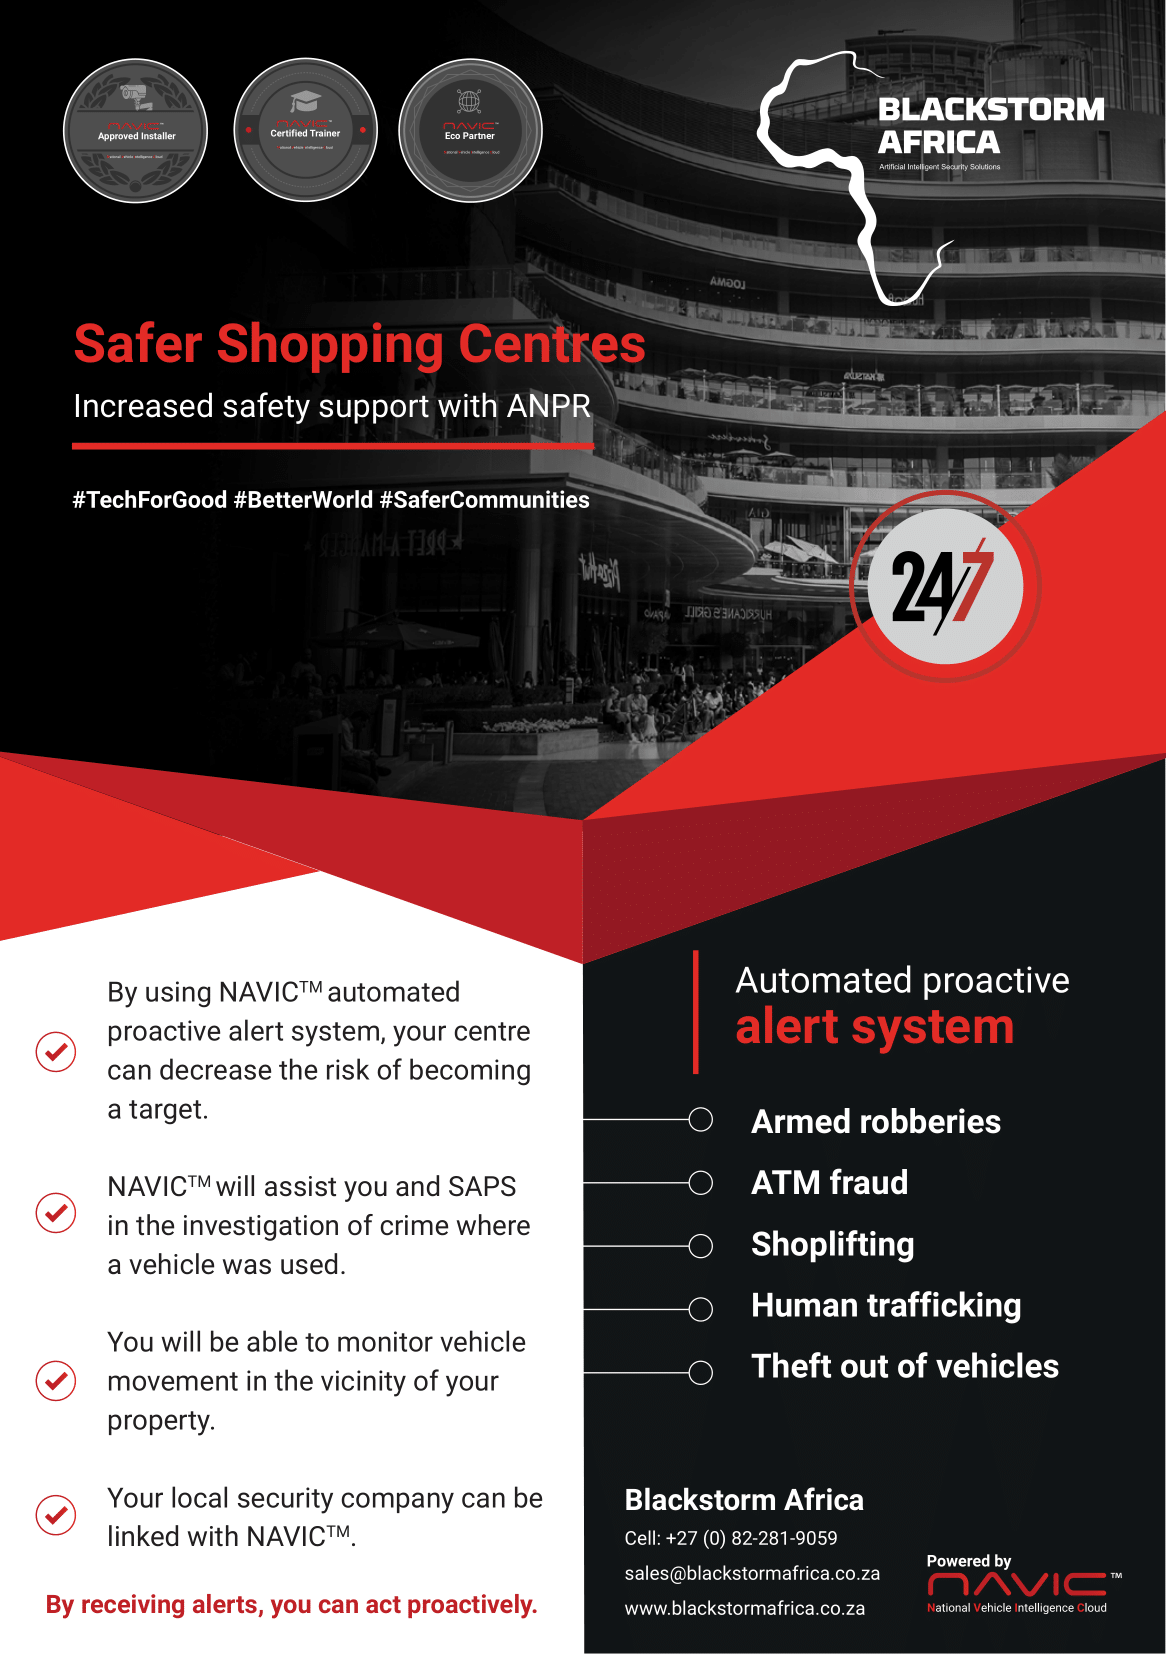 Blackstorm - safer shopping centres-1